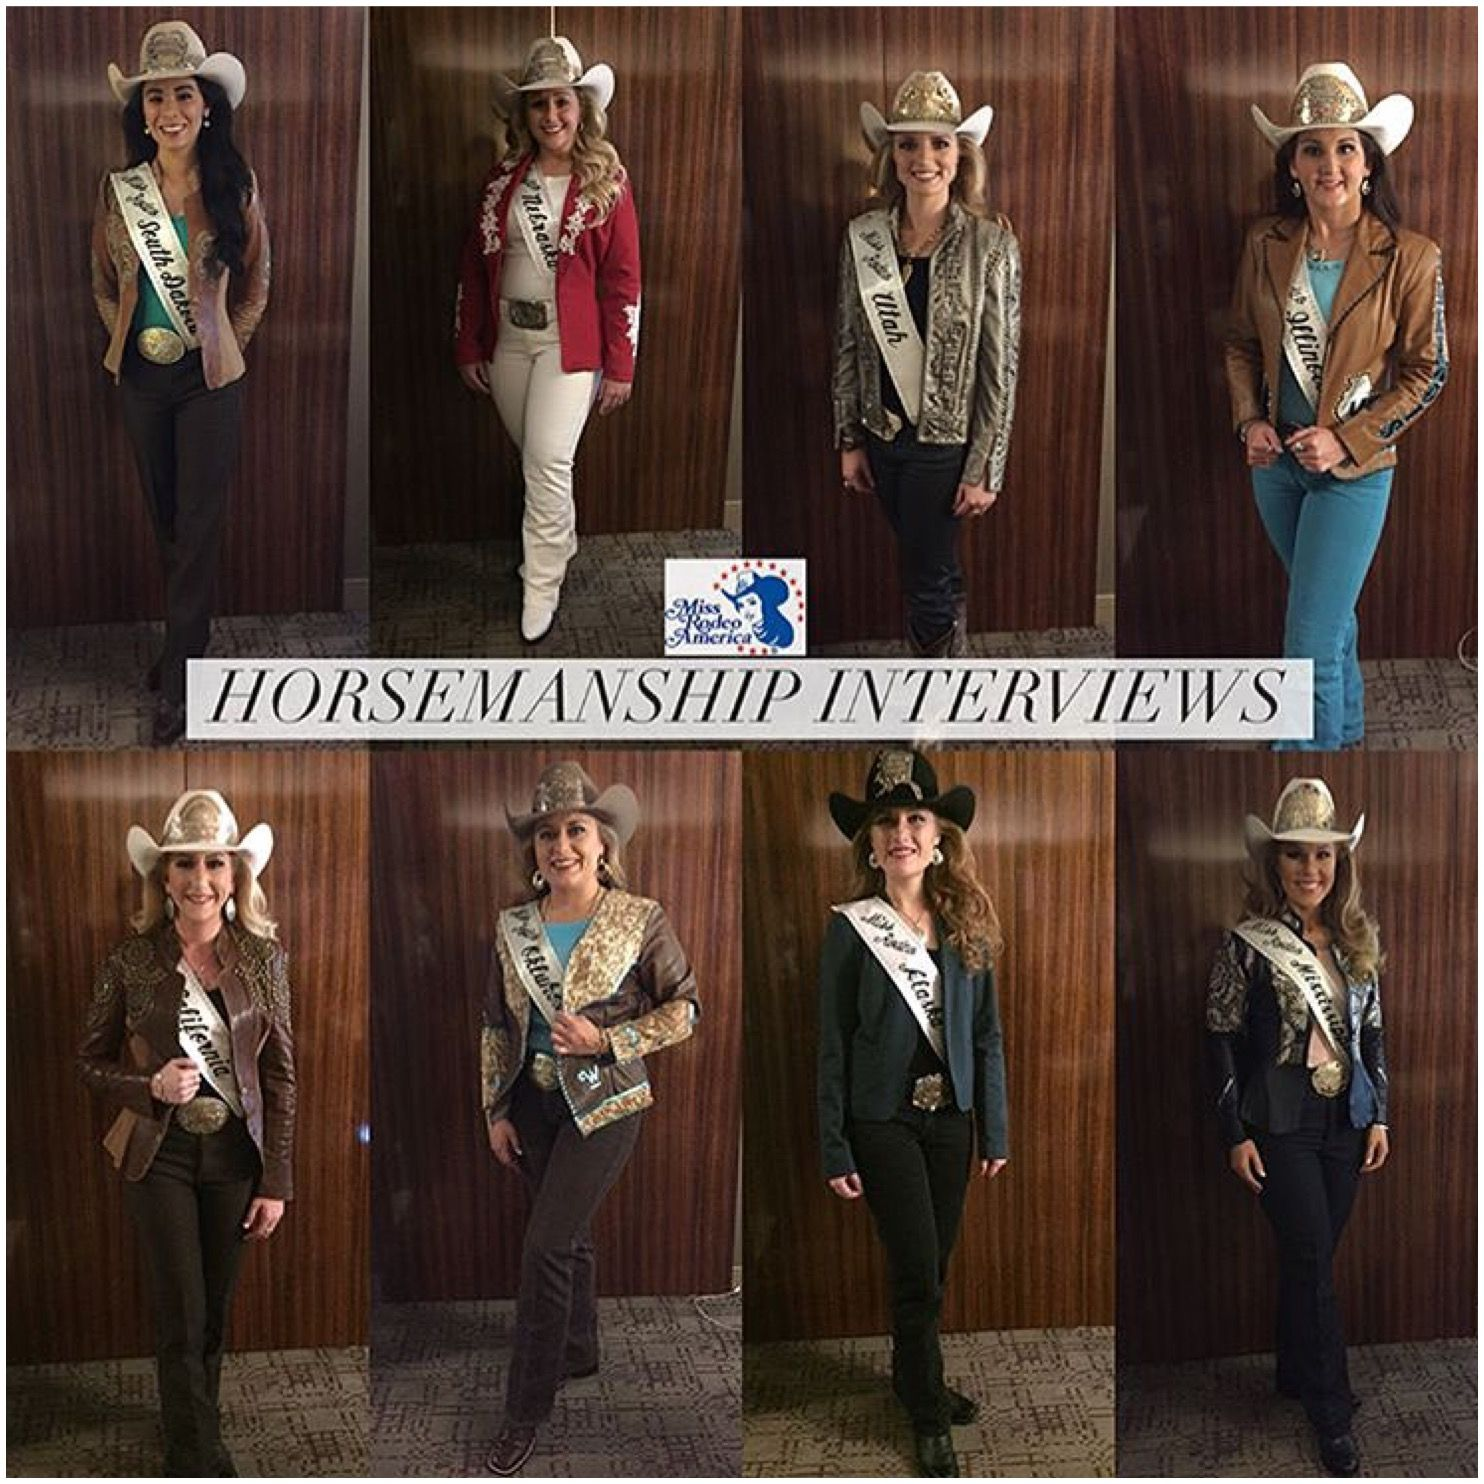 Pin by tia king on rodeo queen rodeo queen horsemanship